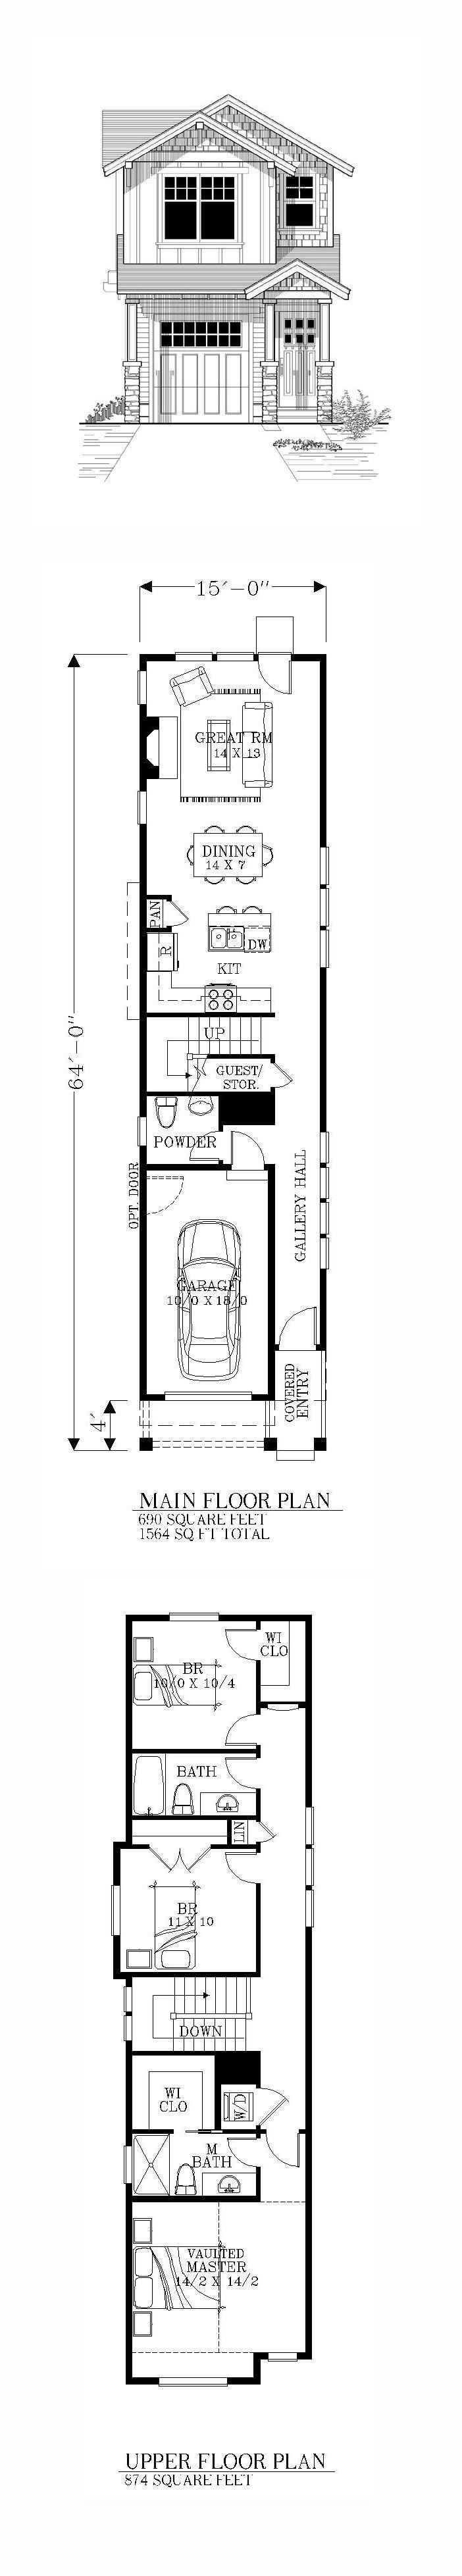 Casa super larga Garaje incluido Casas Pequeas Pinterest